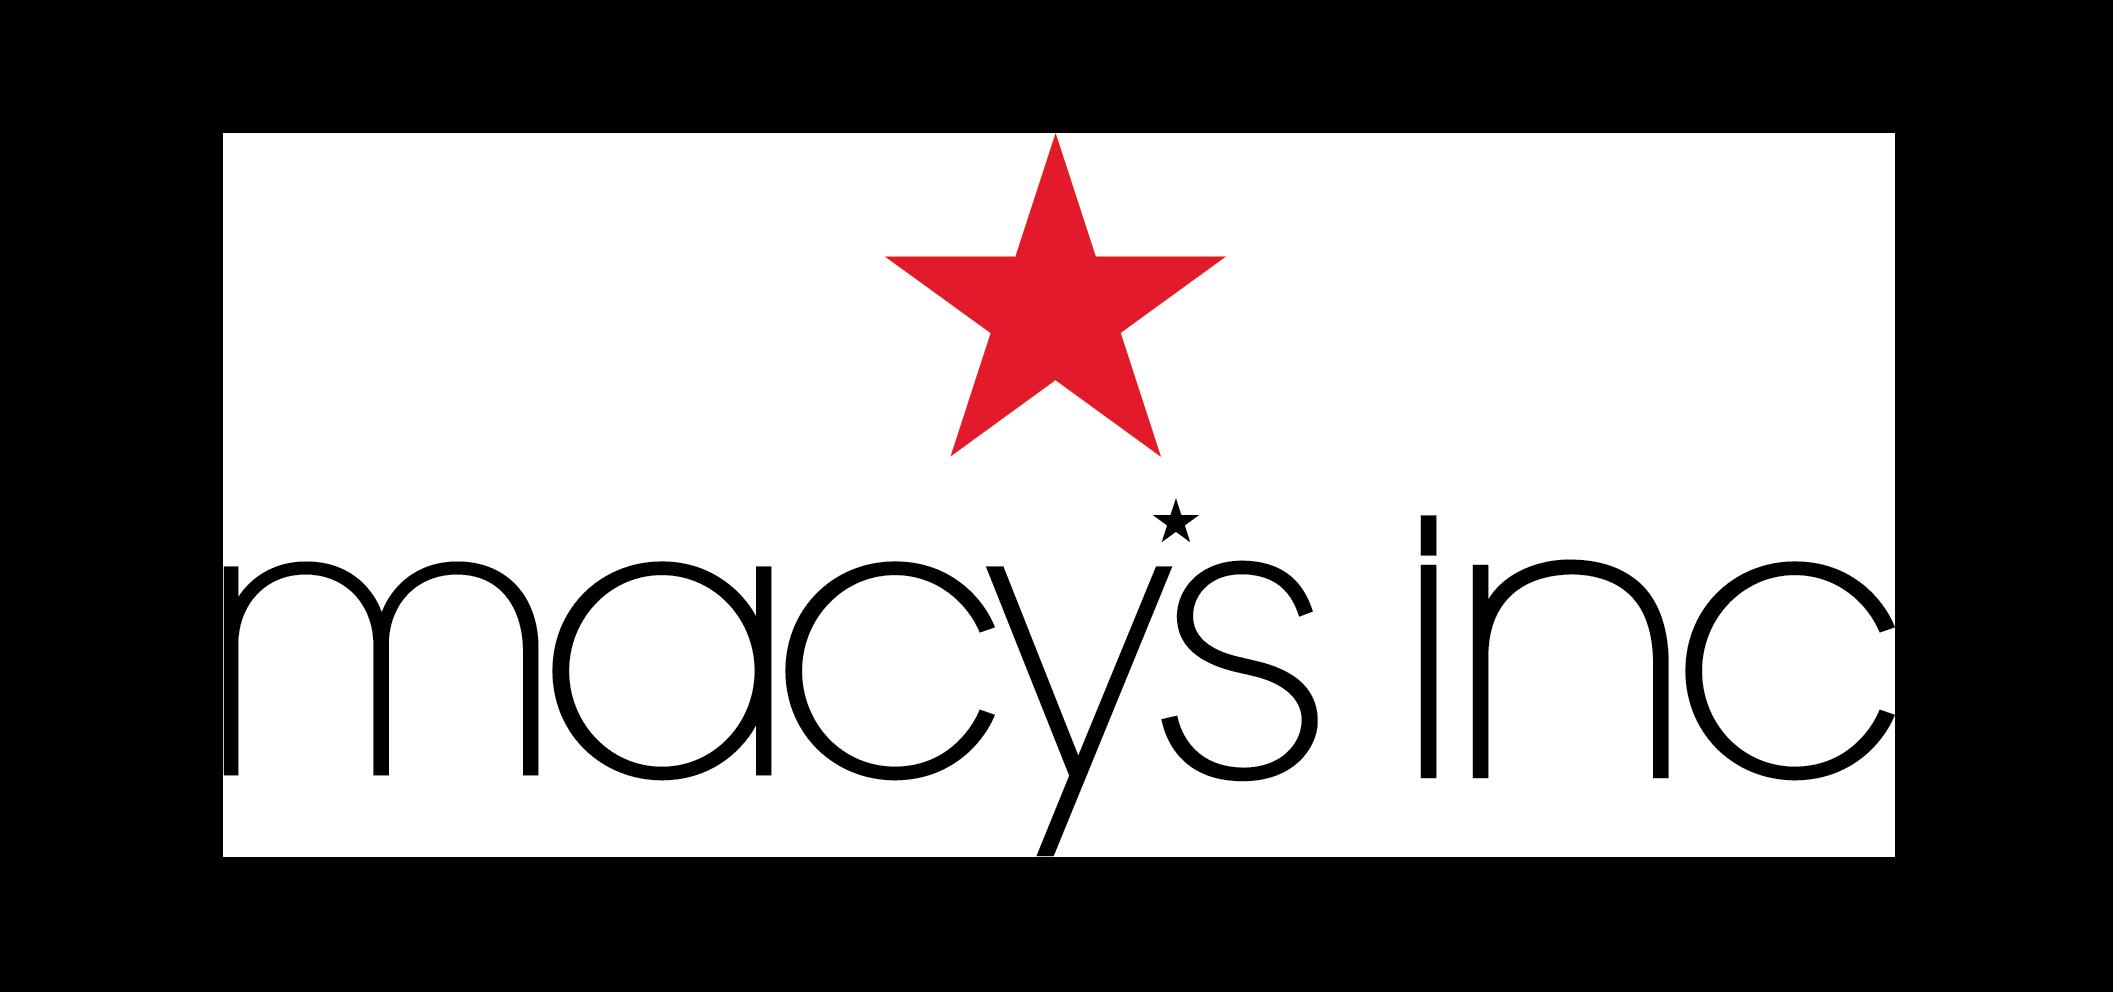 macys-inc-logo-red-black-on-white_high.png